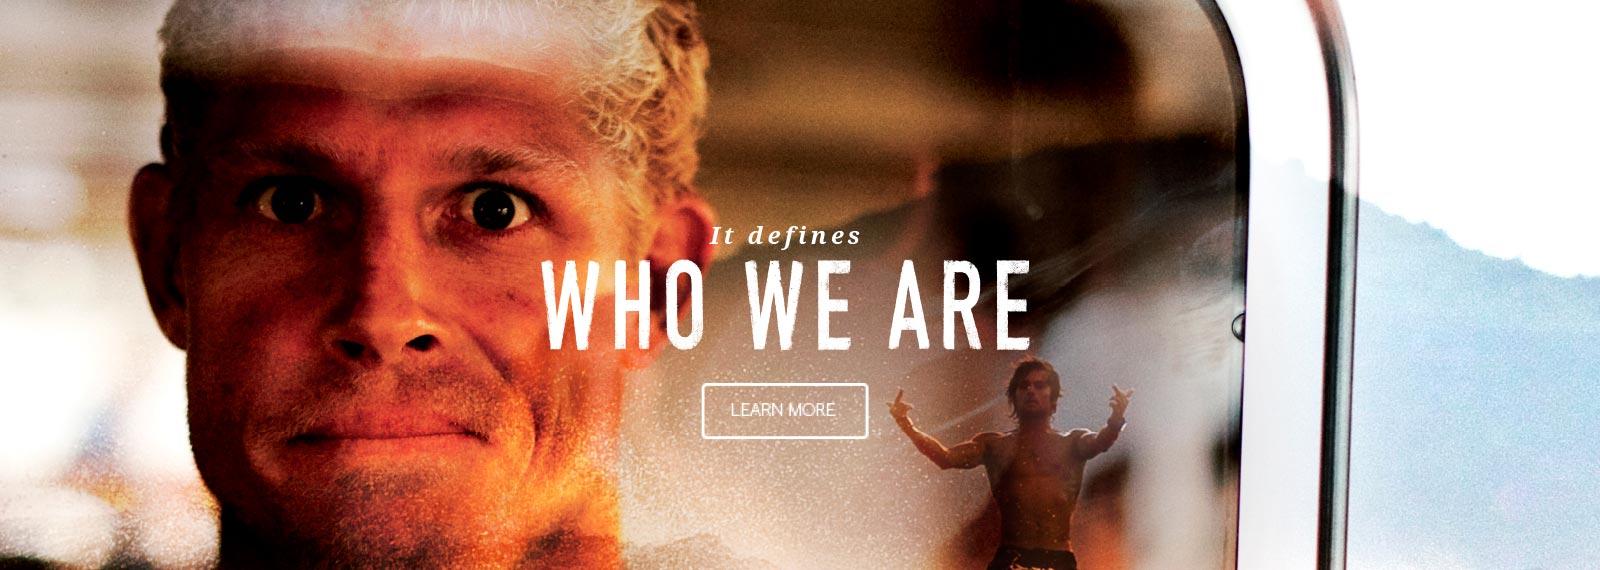 2015-16_WhoWeAre_WebSlider_1600x570_FR